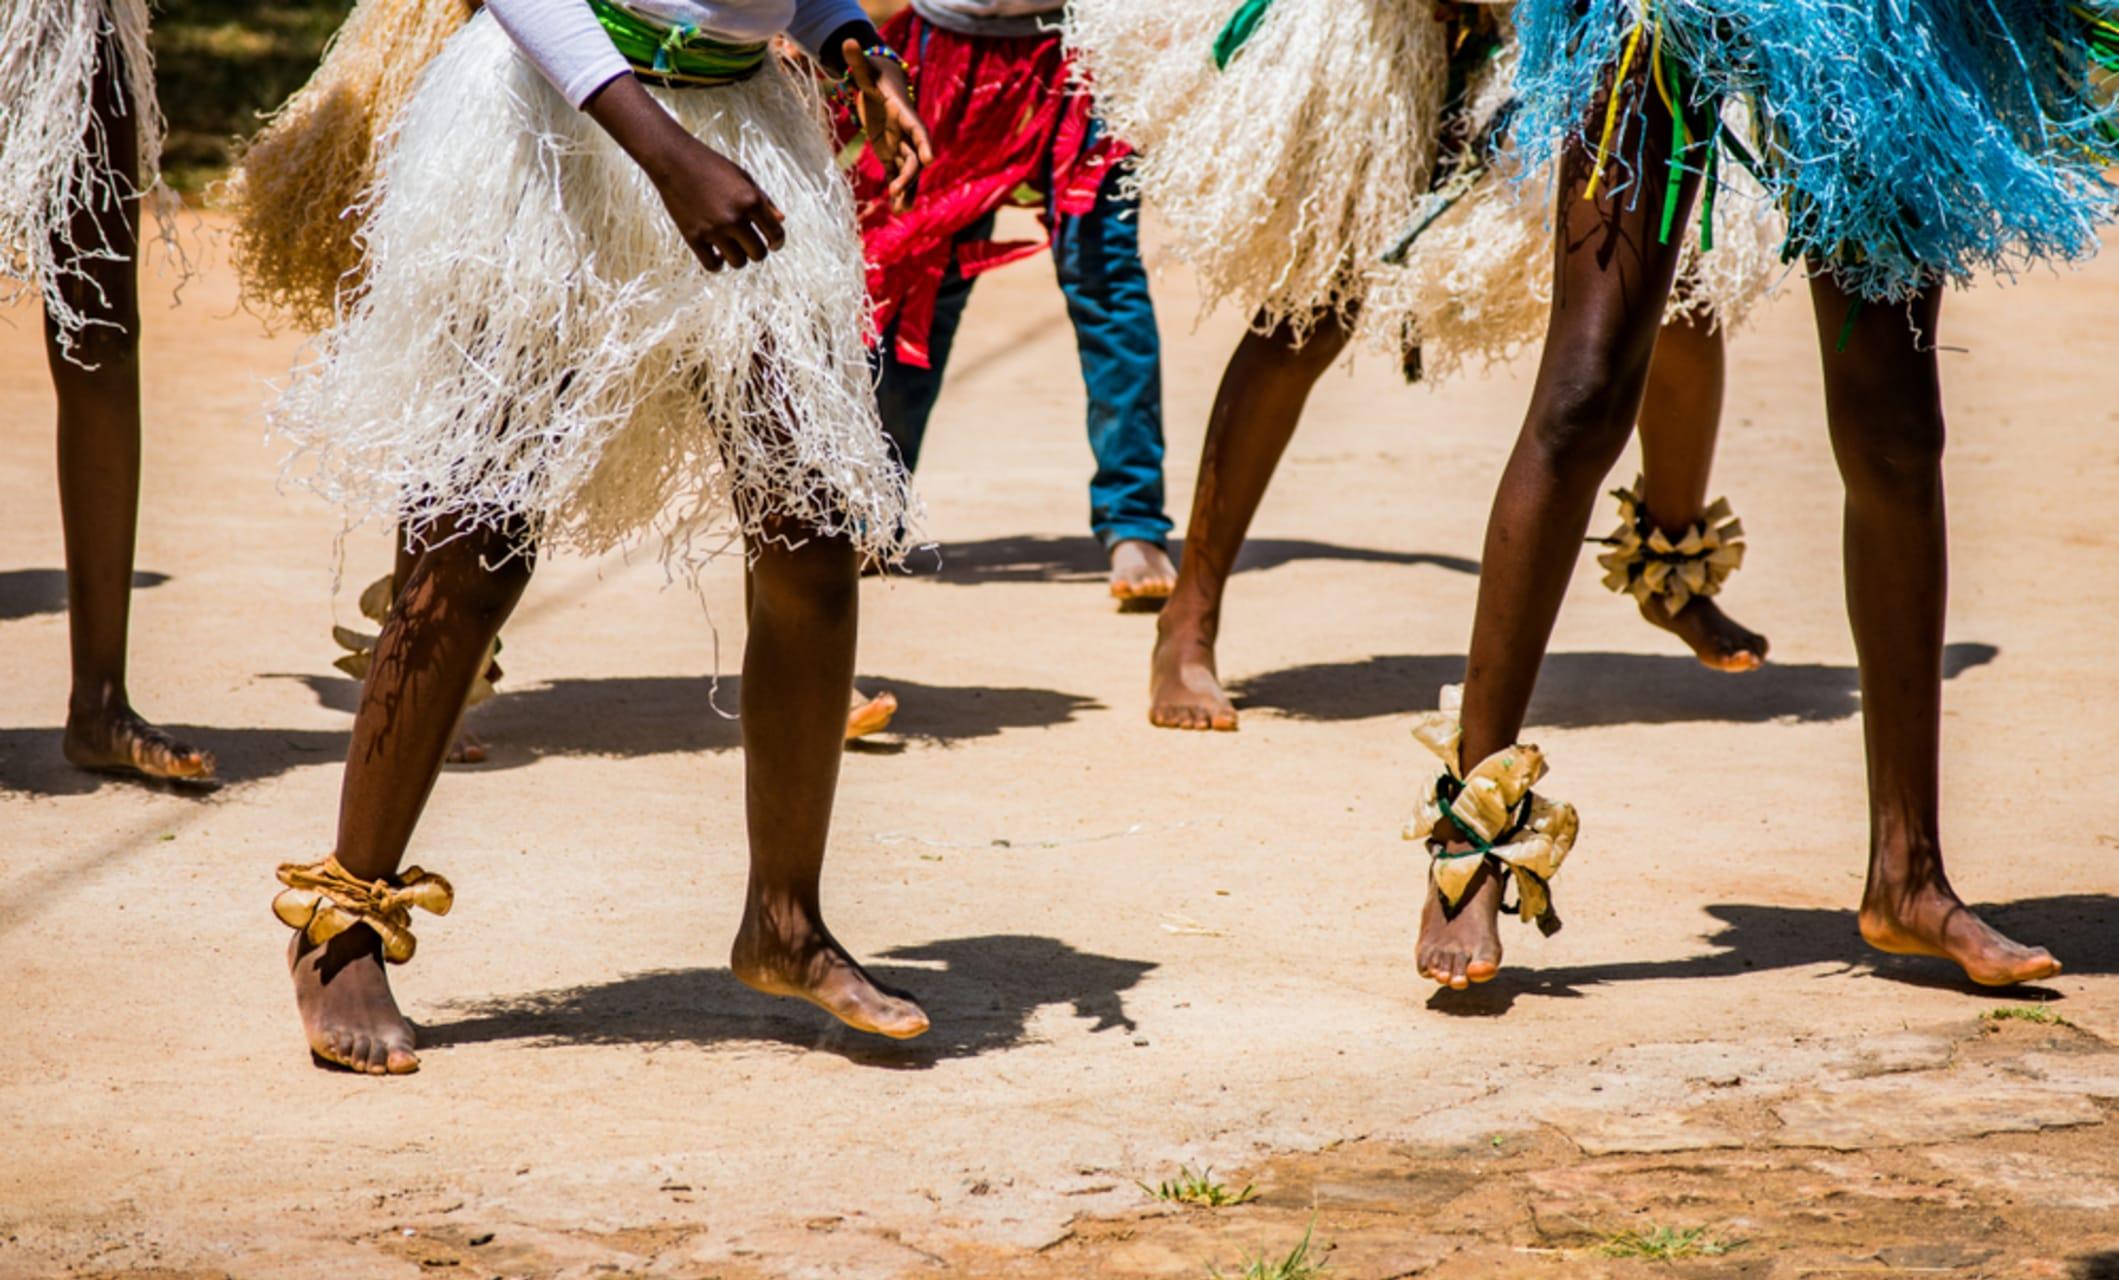 Harare - Live Zimbabwean Music & Dance: The Tsoro Cultural Center